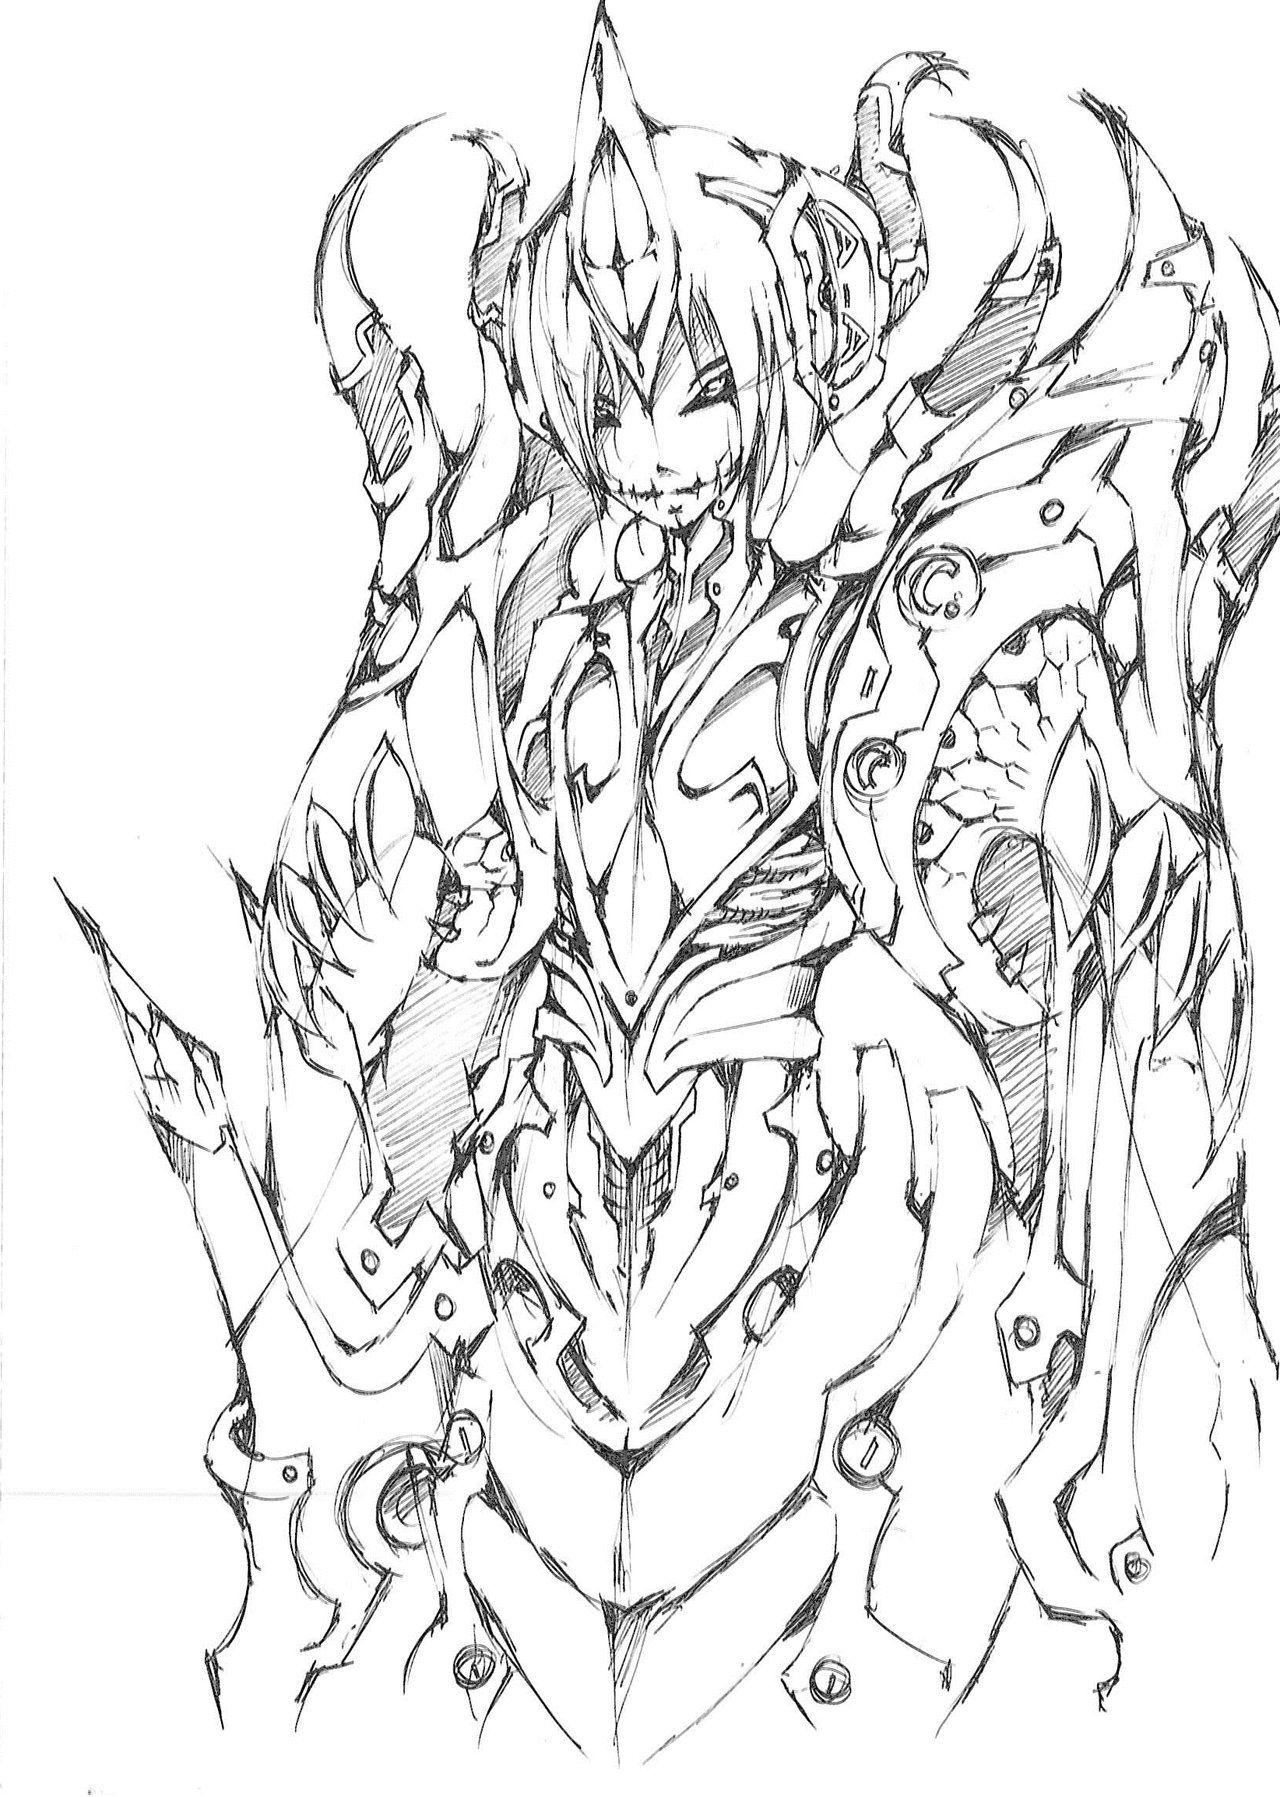 Ceberus by ZephyraVirgox.deviantart.com on @deviantART